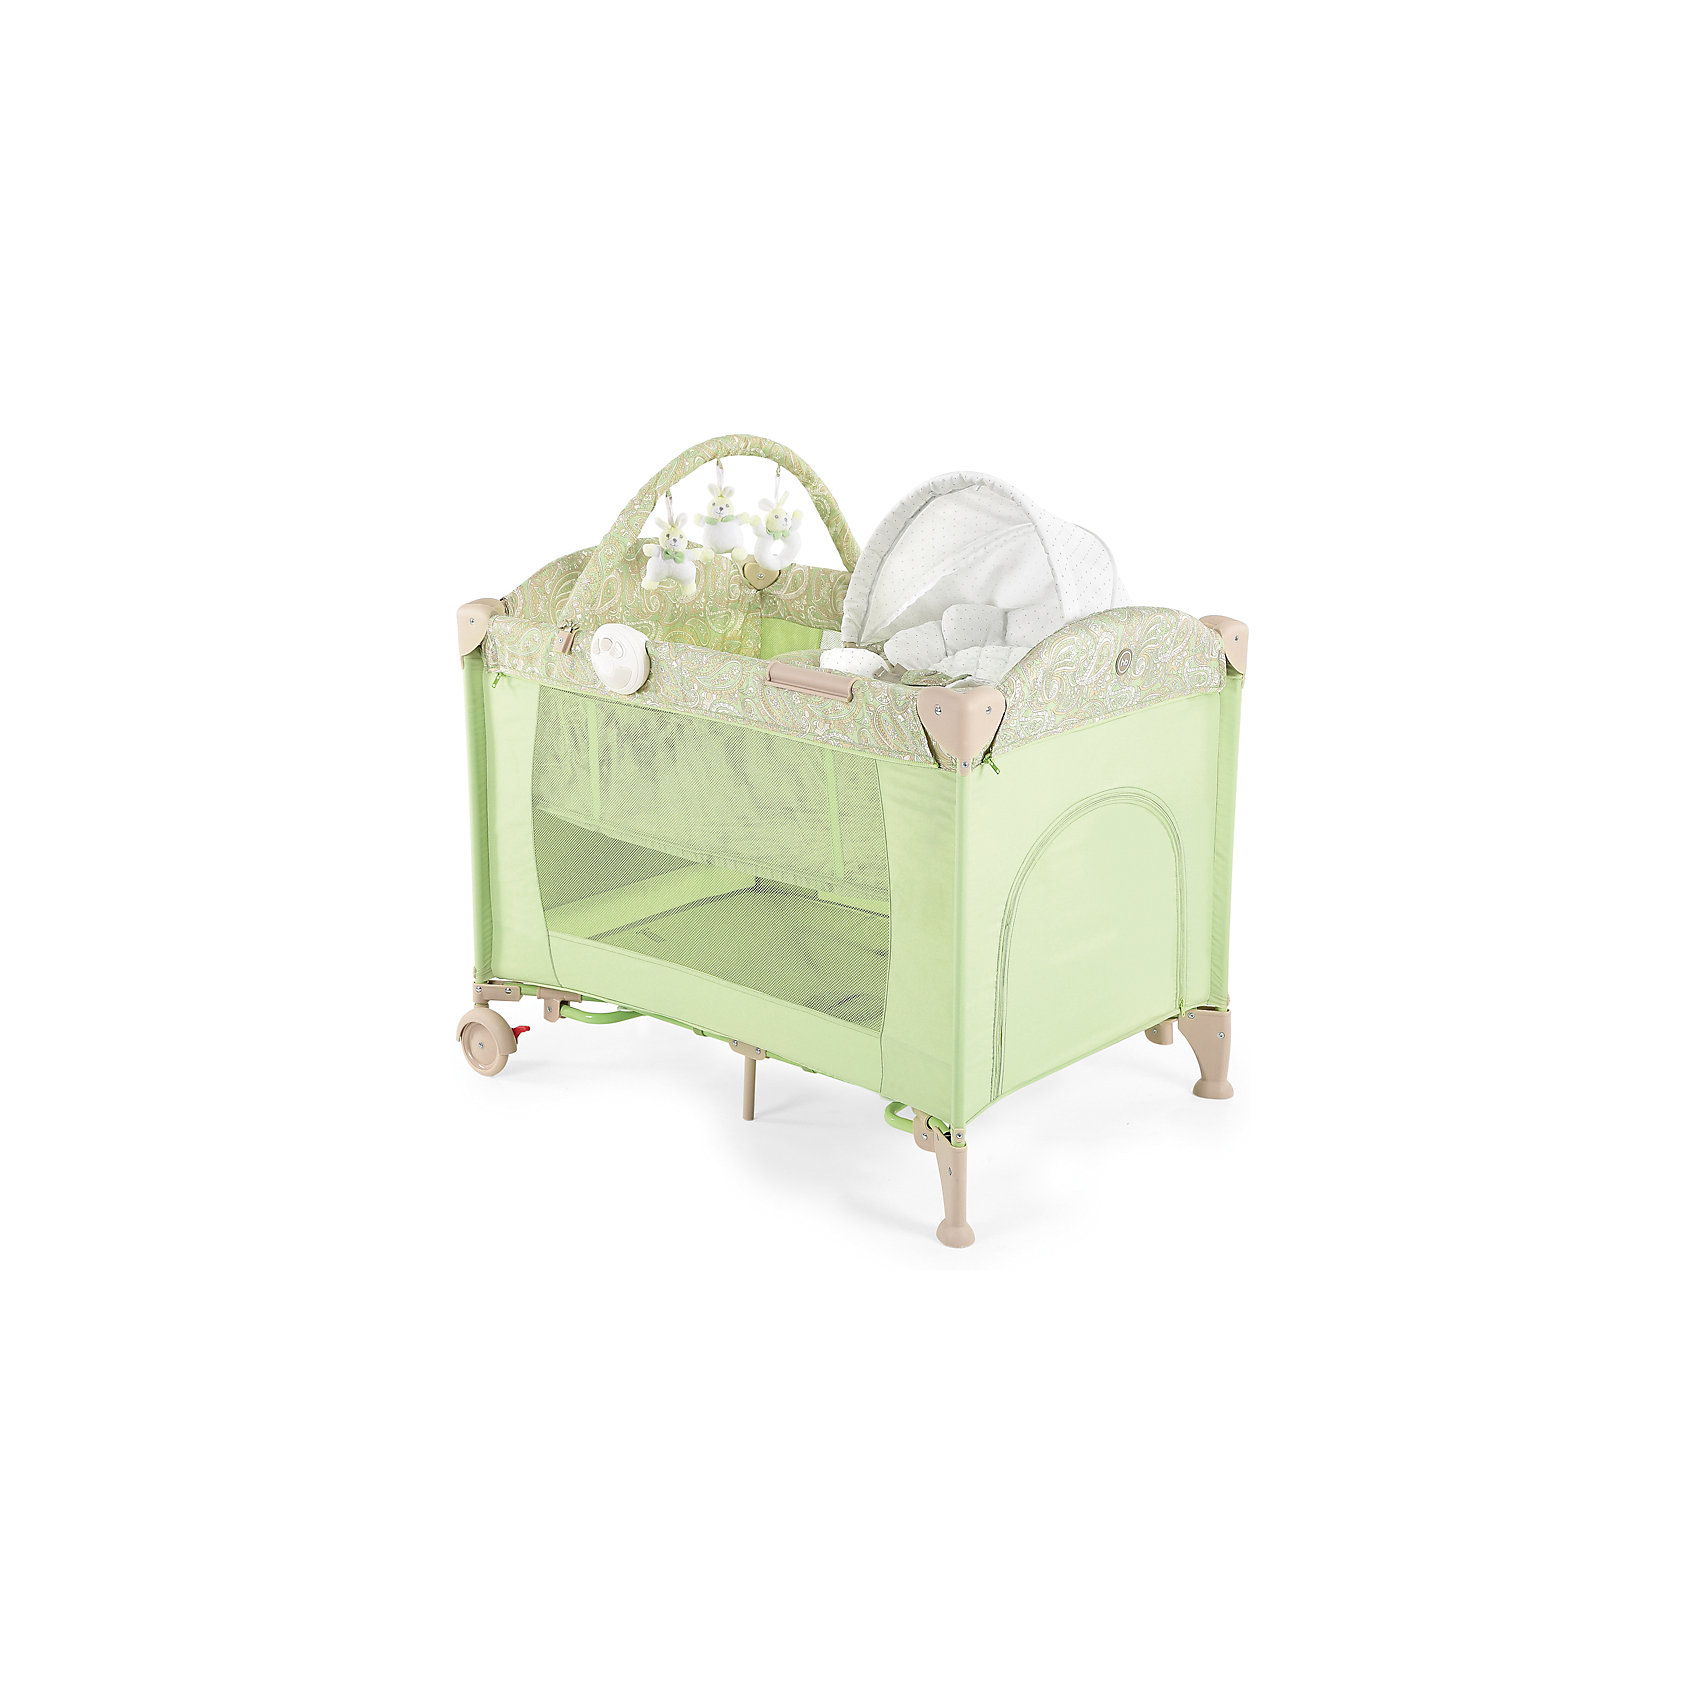 Happy Baby Кровать-манеж LAGOON V2, Happy Baby, зеленый happy baby ходунки smiley v2 цвет голубой